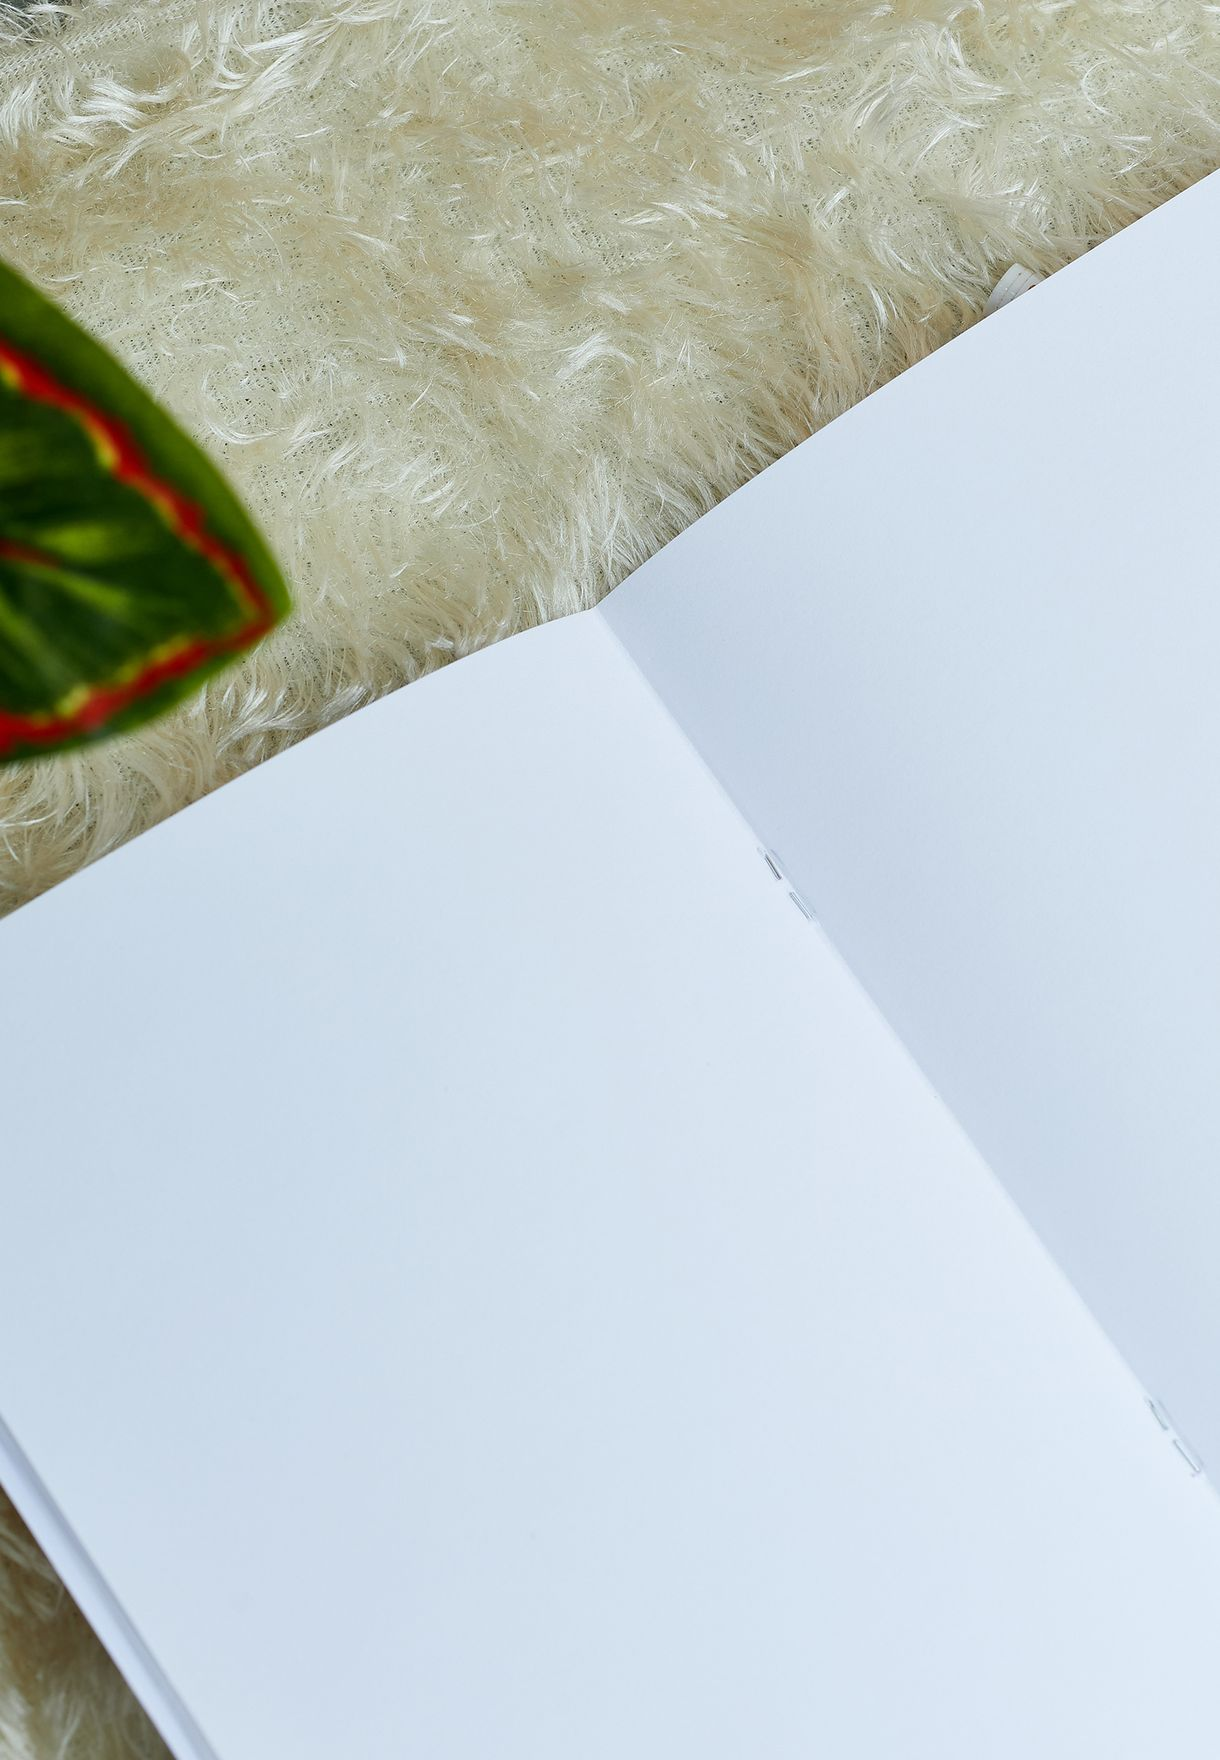 دفتر ملاحظات ملون